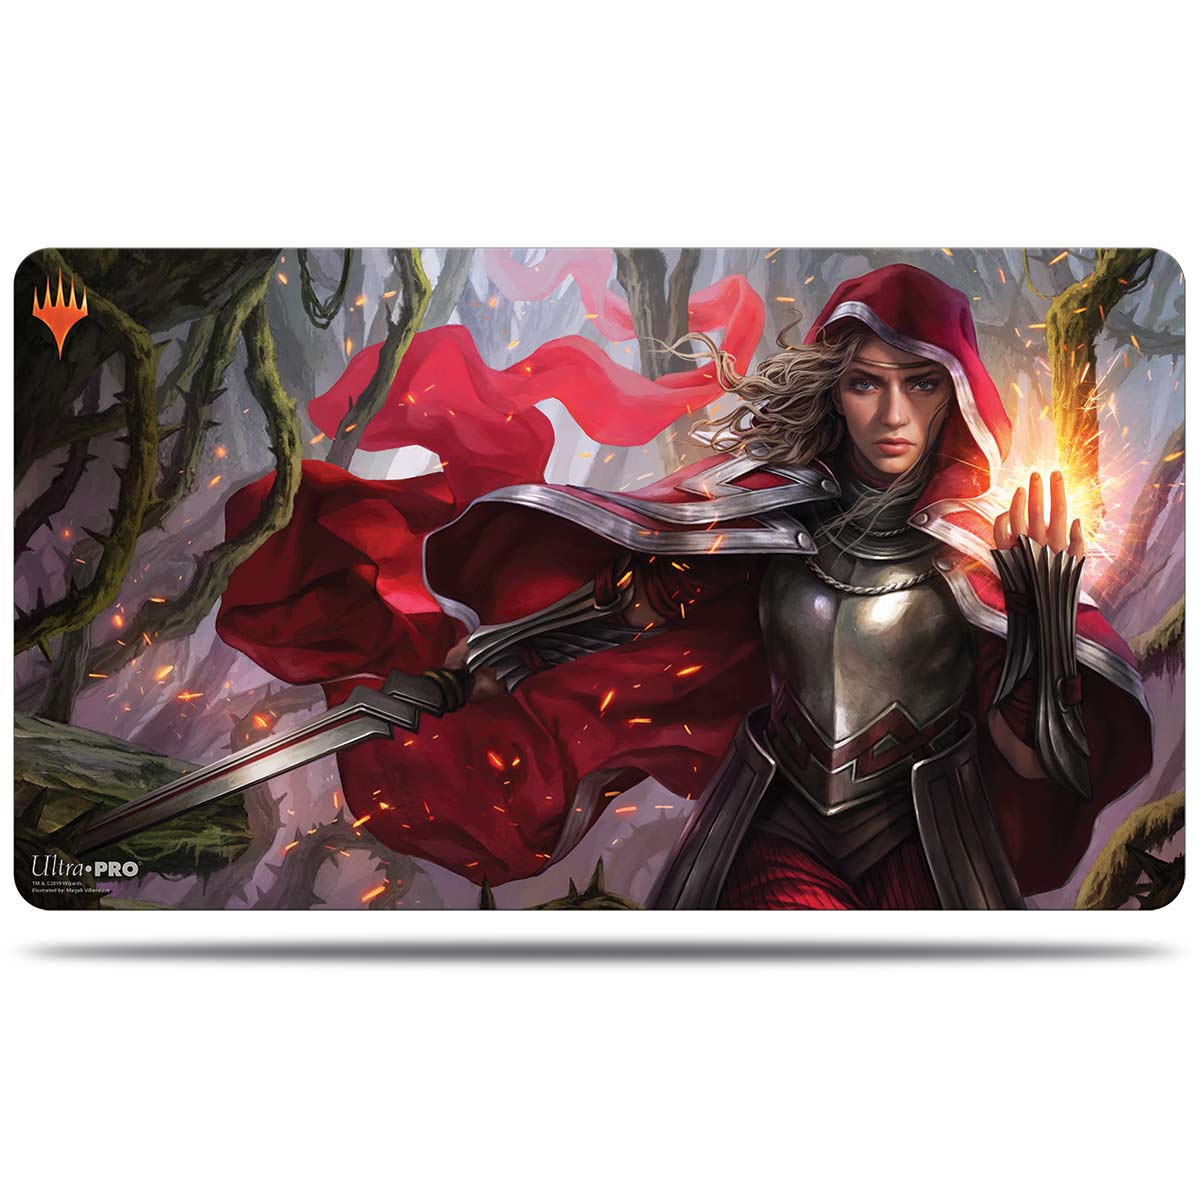 Ultra Pro - Throne of Eldraine - Playmat - Rowan Kenrith